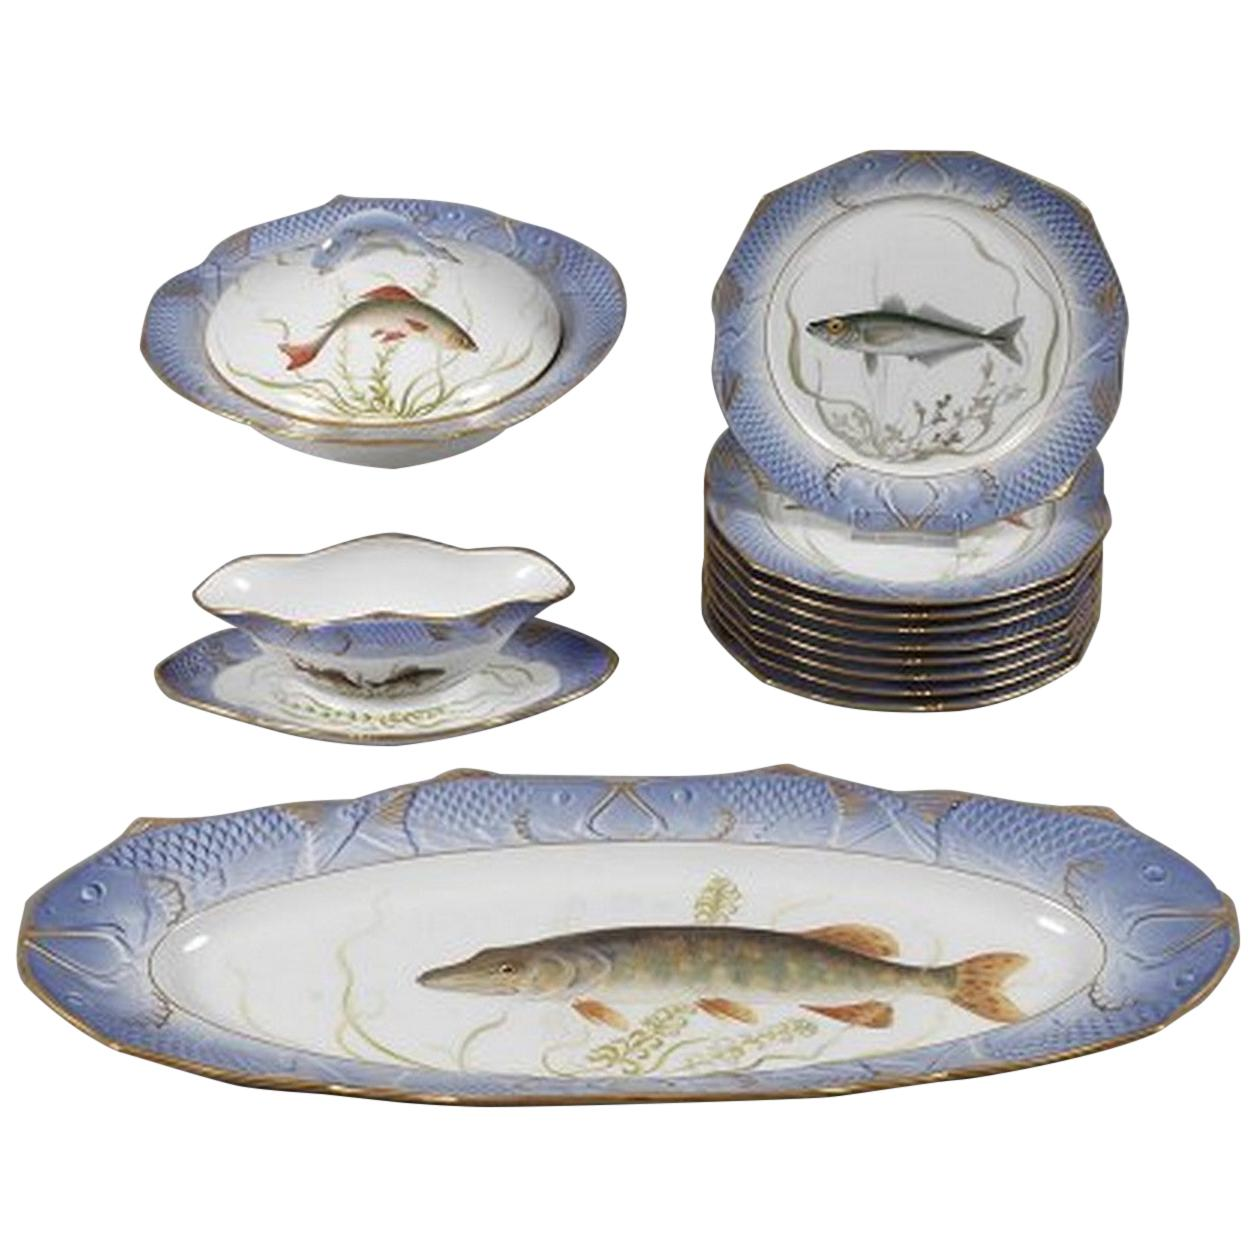 Royal Copenhagen Blue Fish Service for 8 Persons